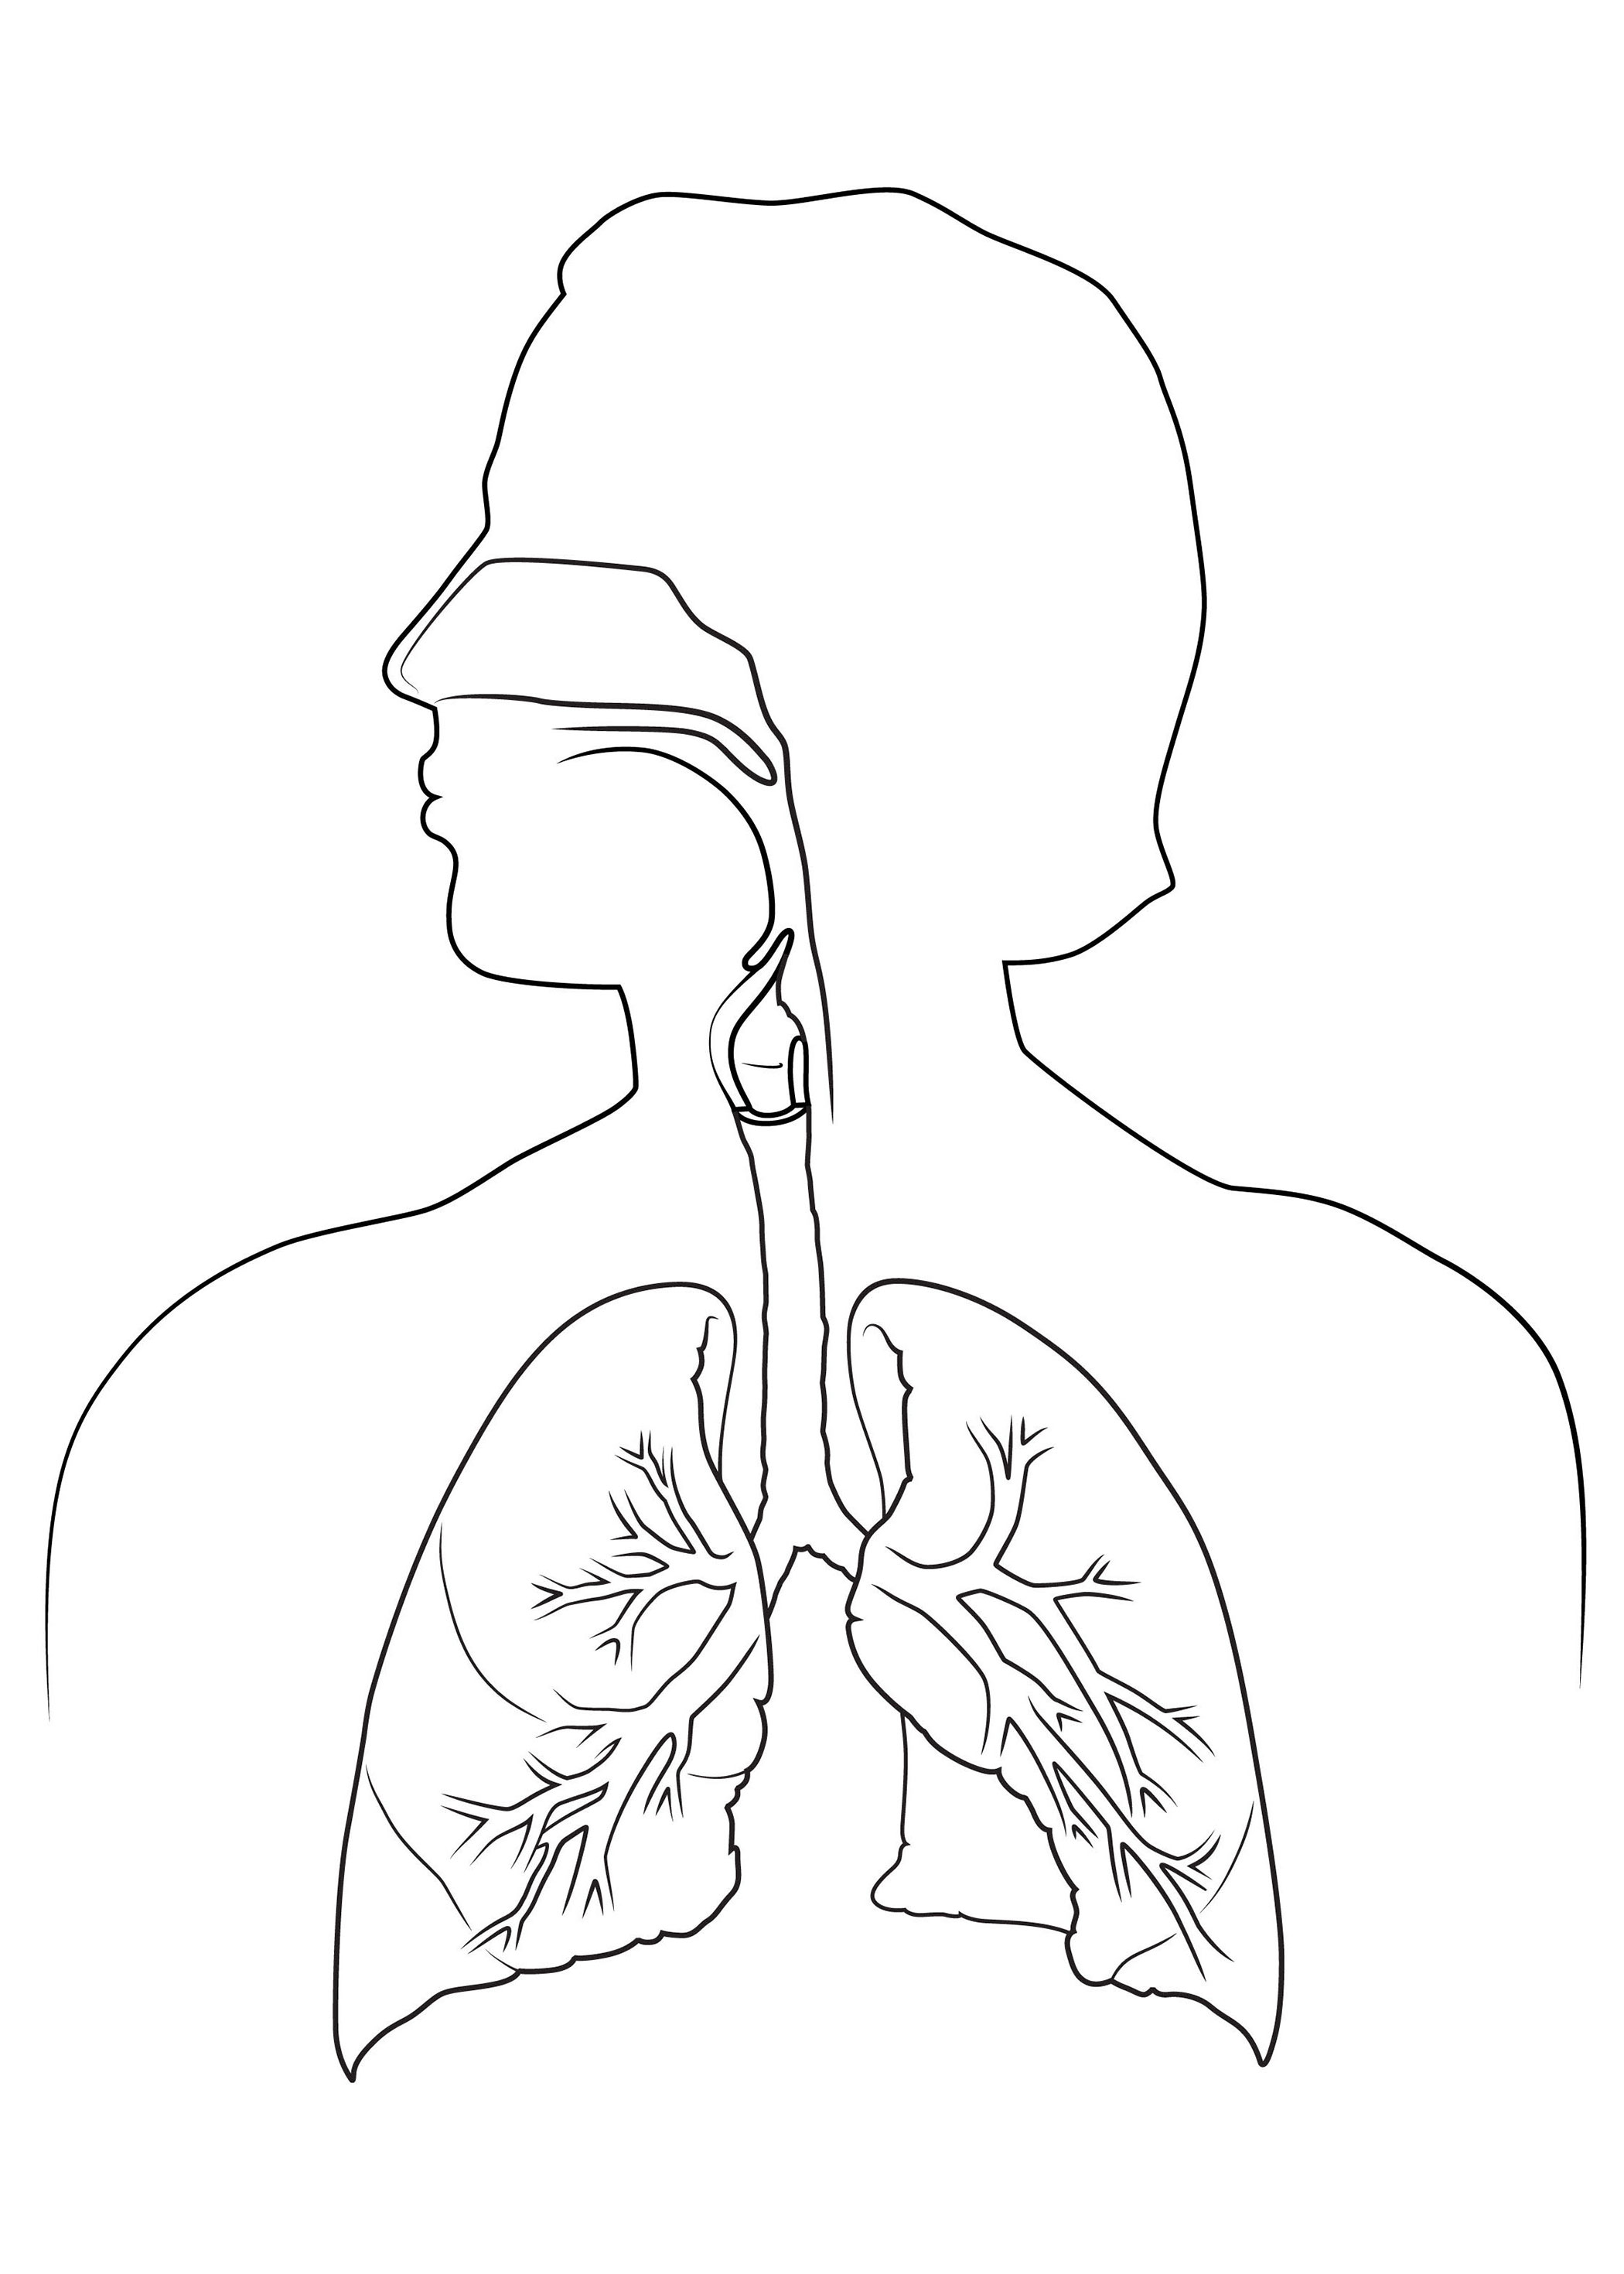 Medical Body Drawing At Getdrawings